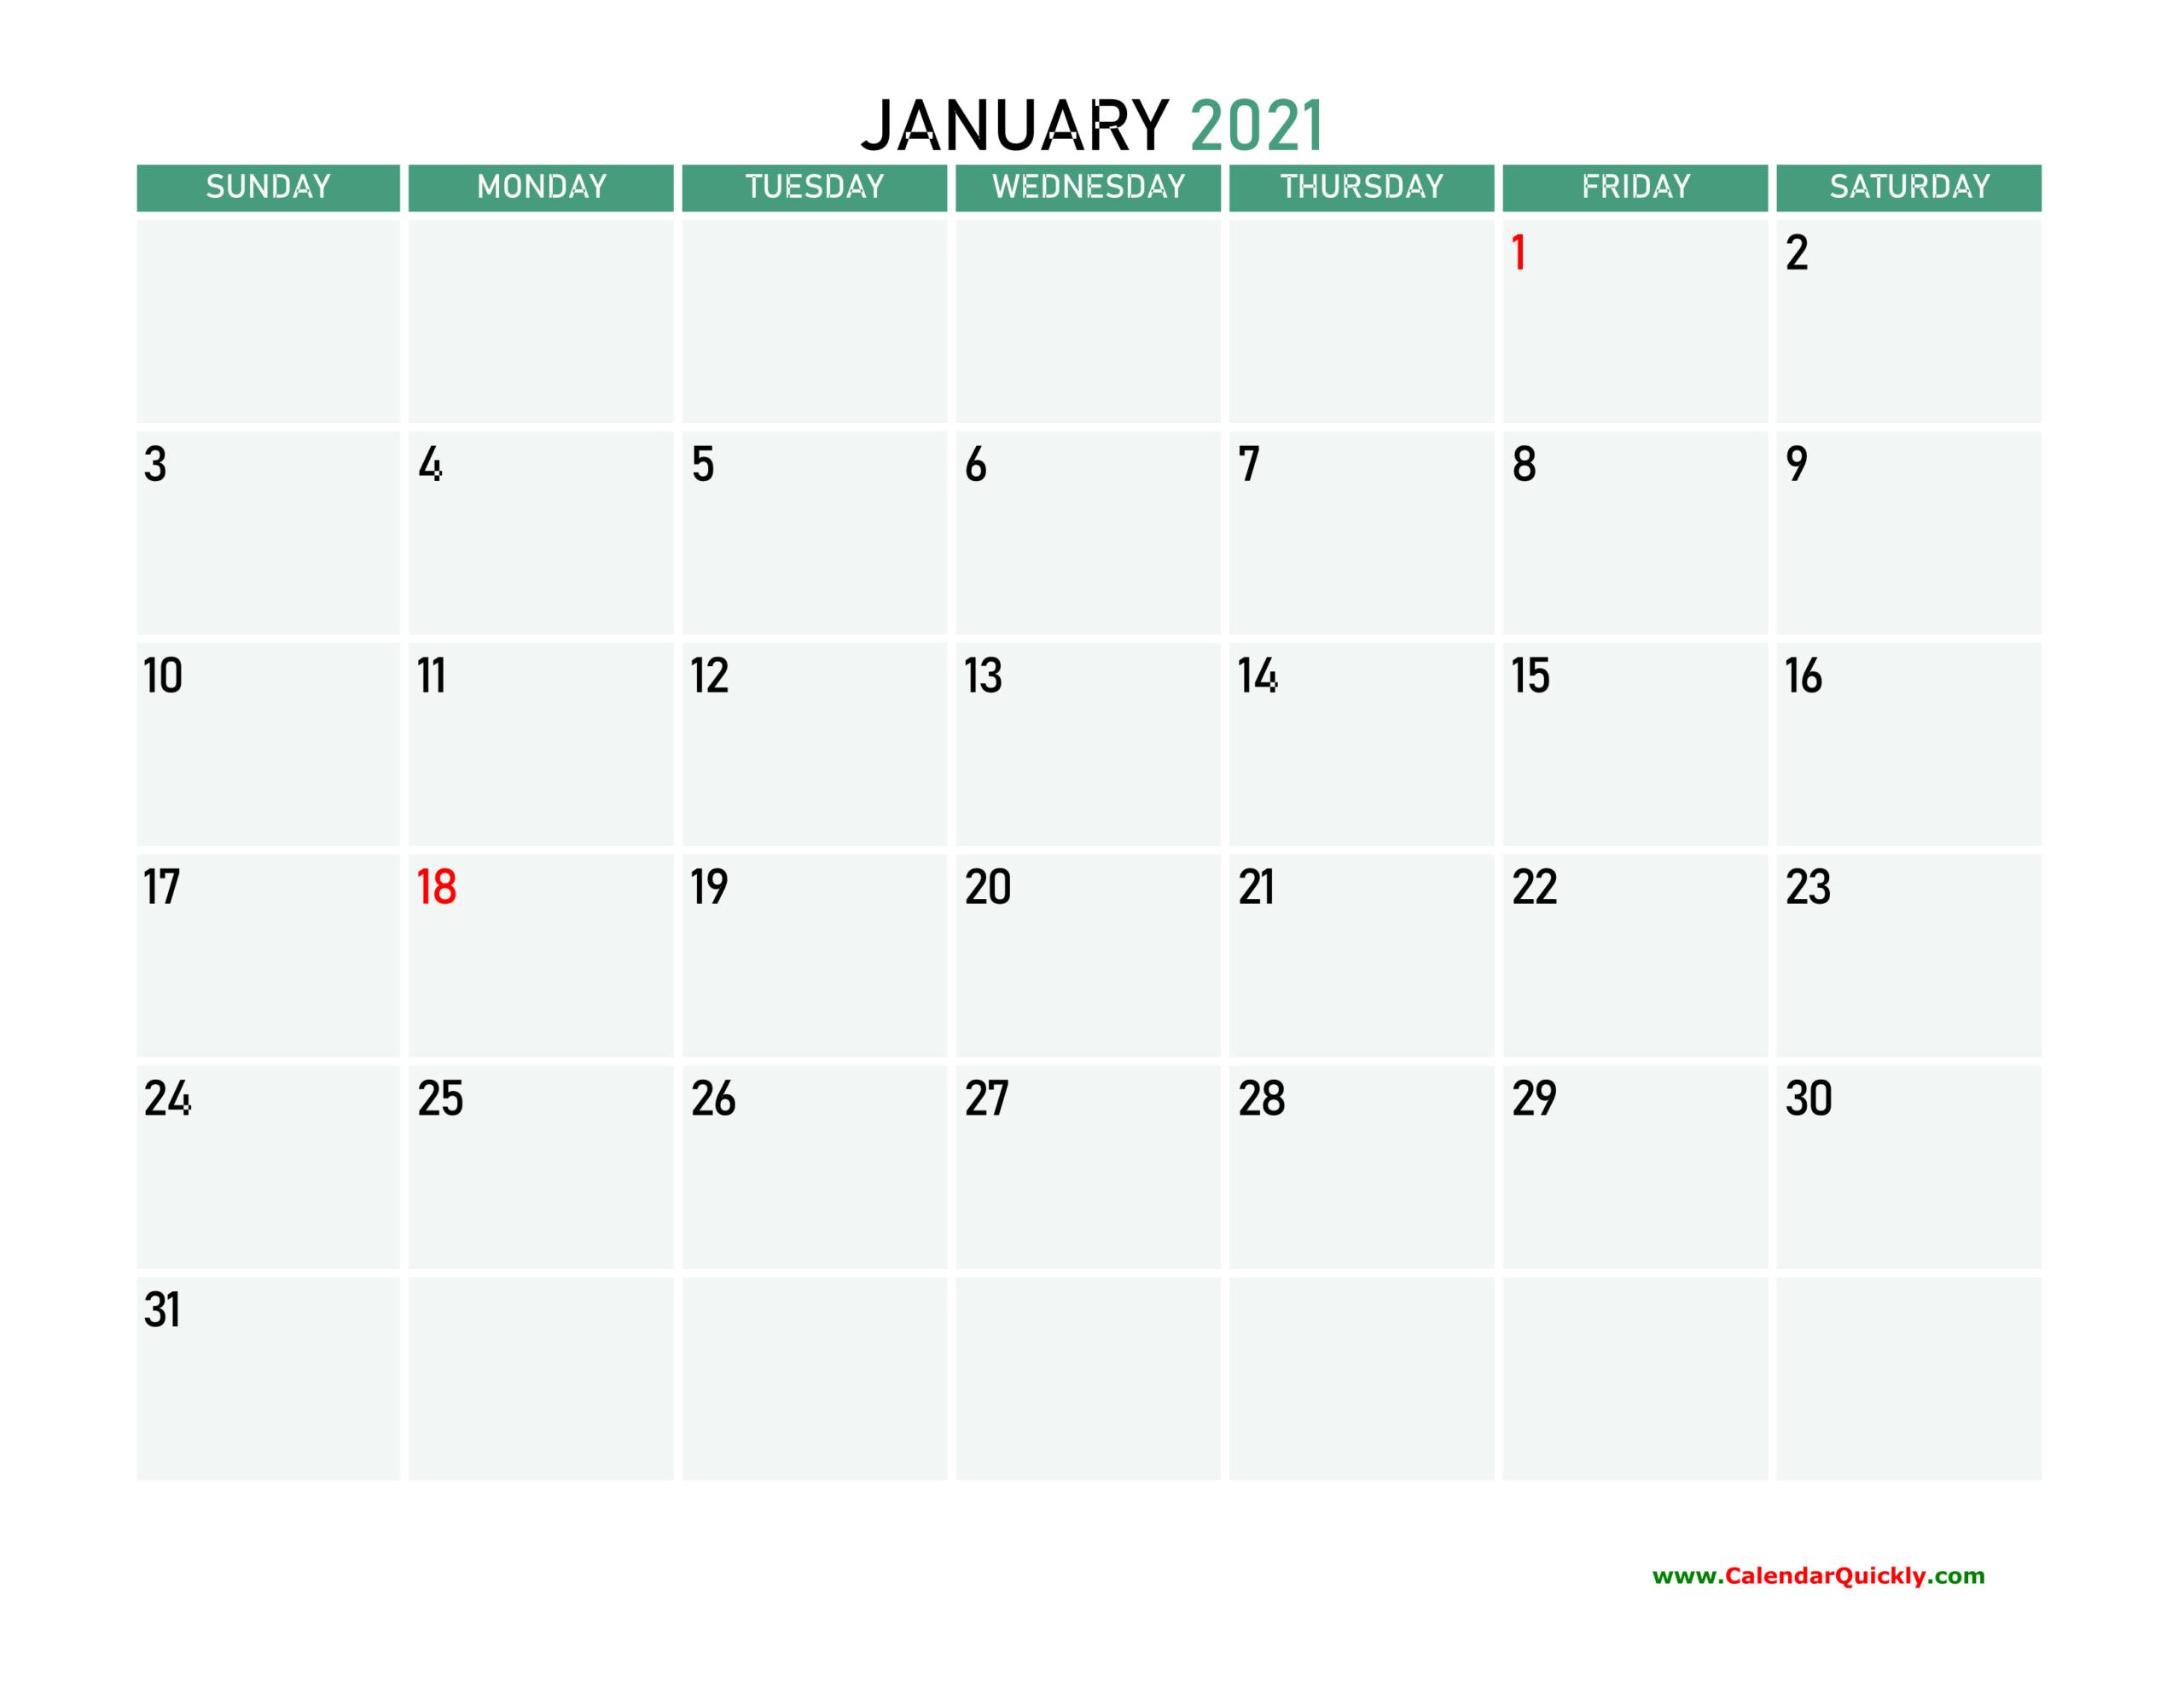 Monthly 2021 Printable Calendar   Calendar Quickly